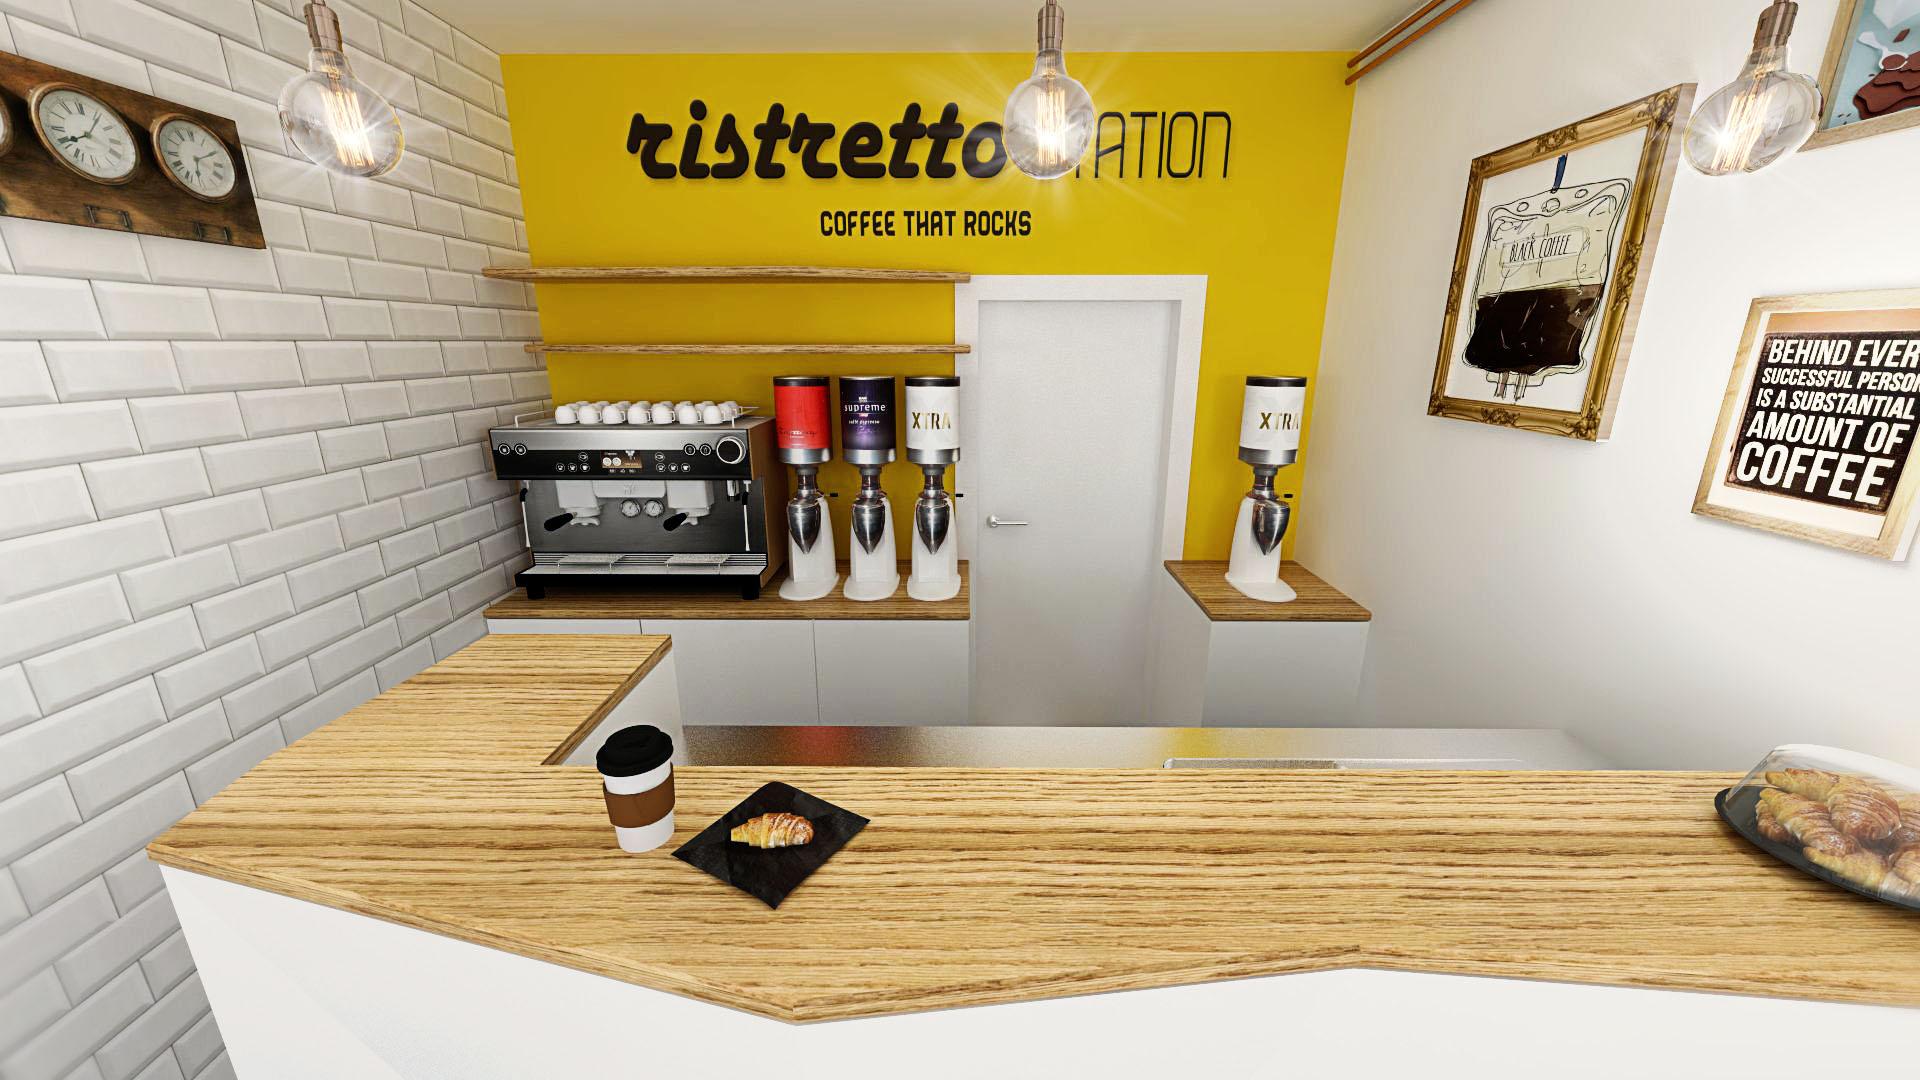 RISTRETTO STATION COFFEE SHOP 4